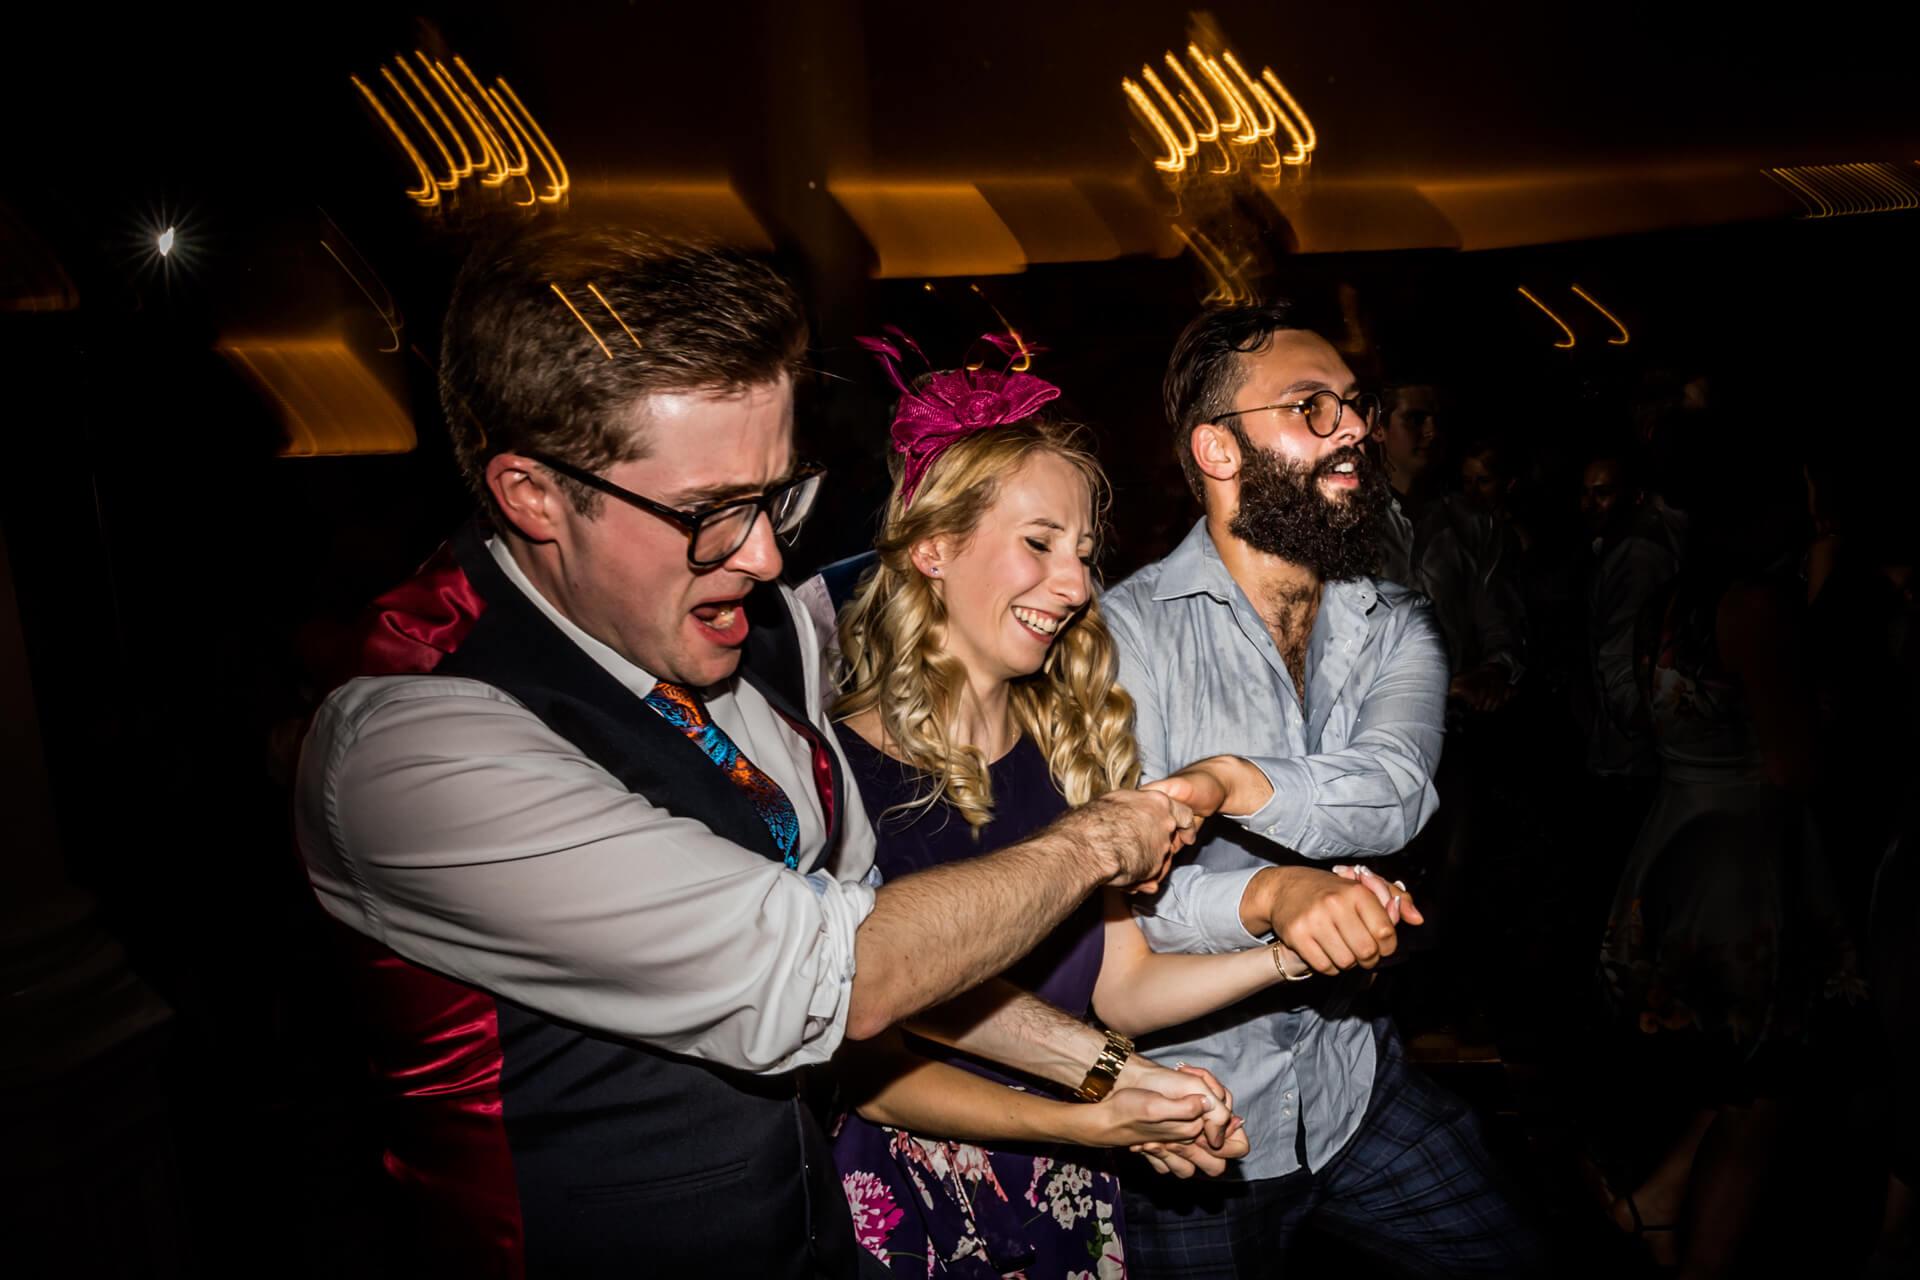 three wedding guests dancing arm in arm